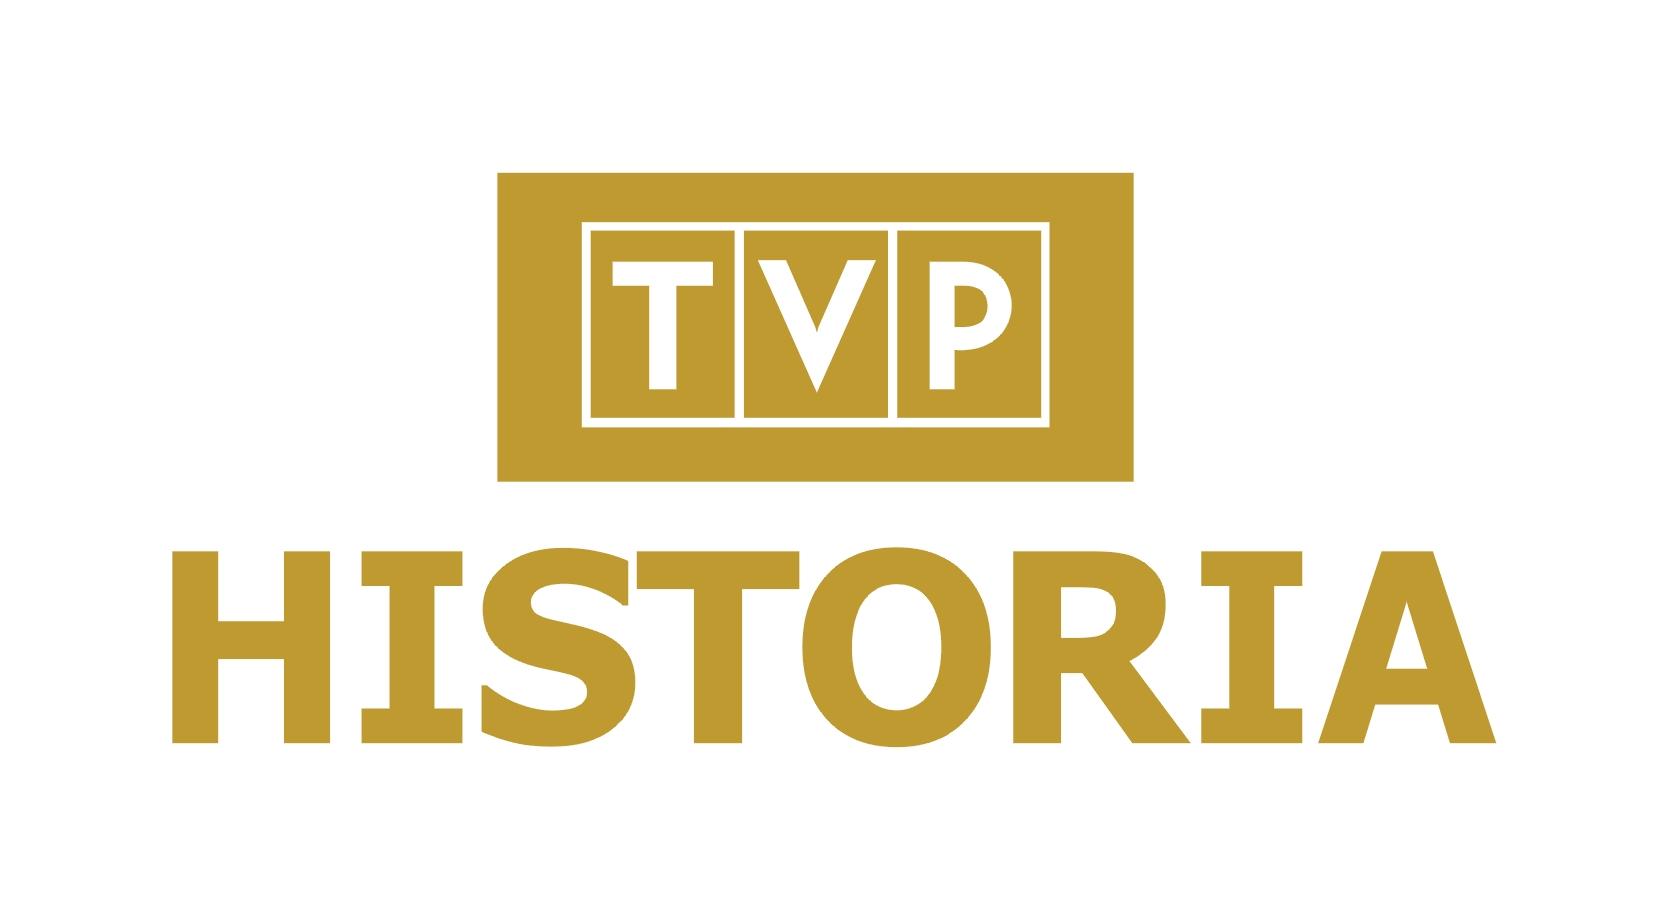 https://historia.tvp.pl/